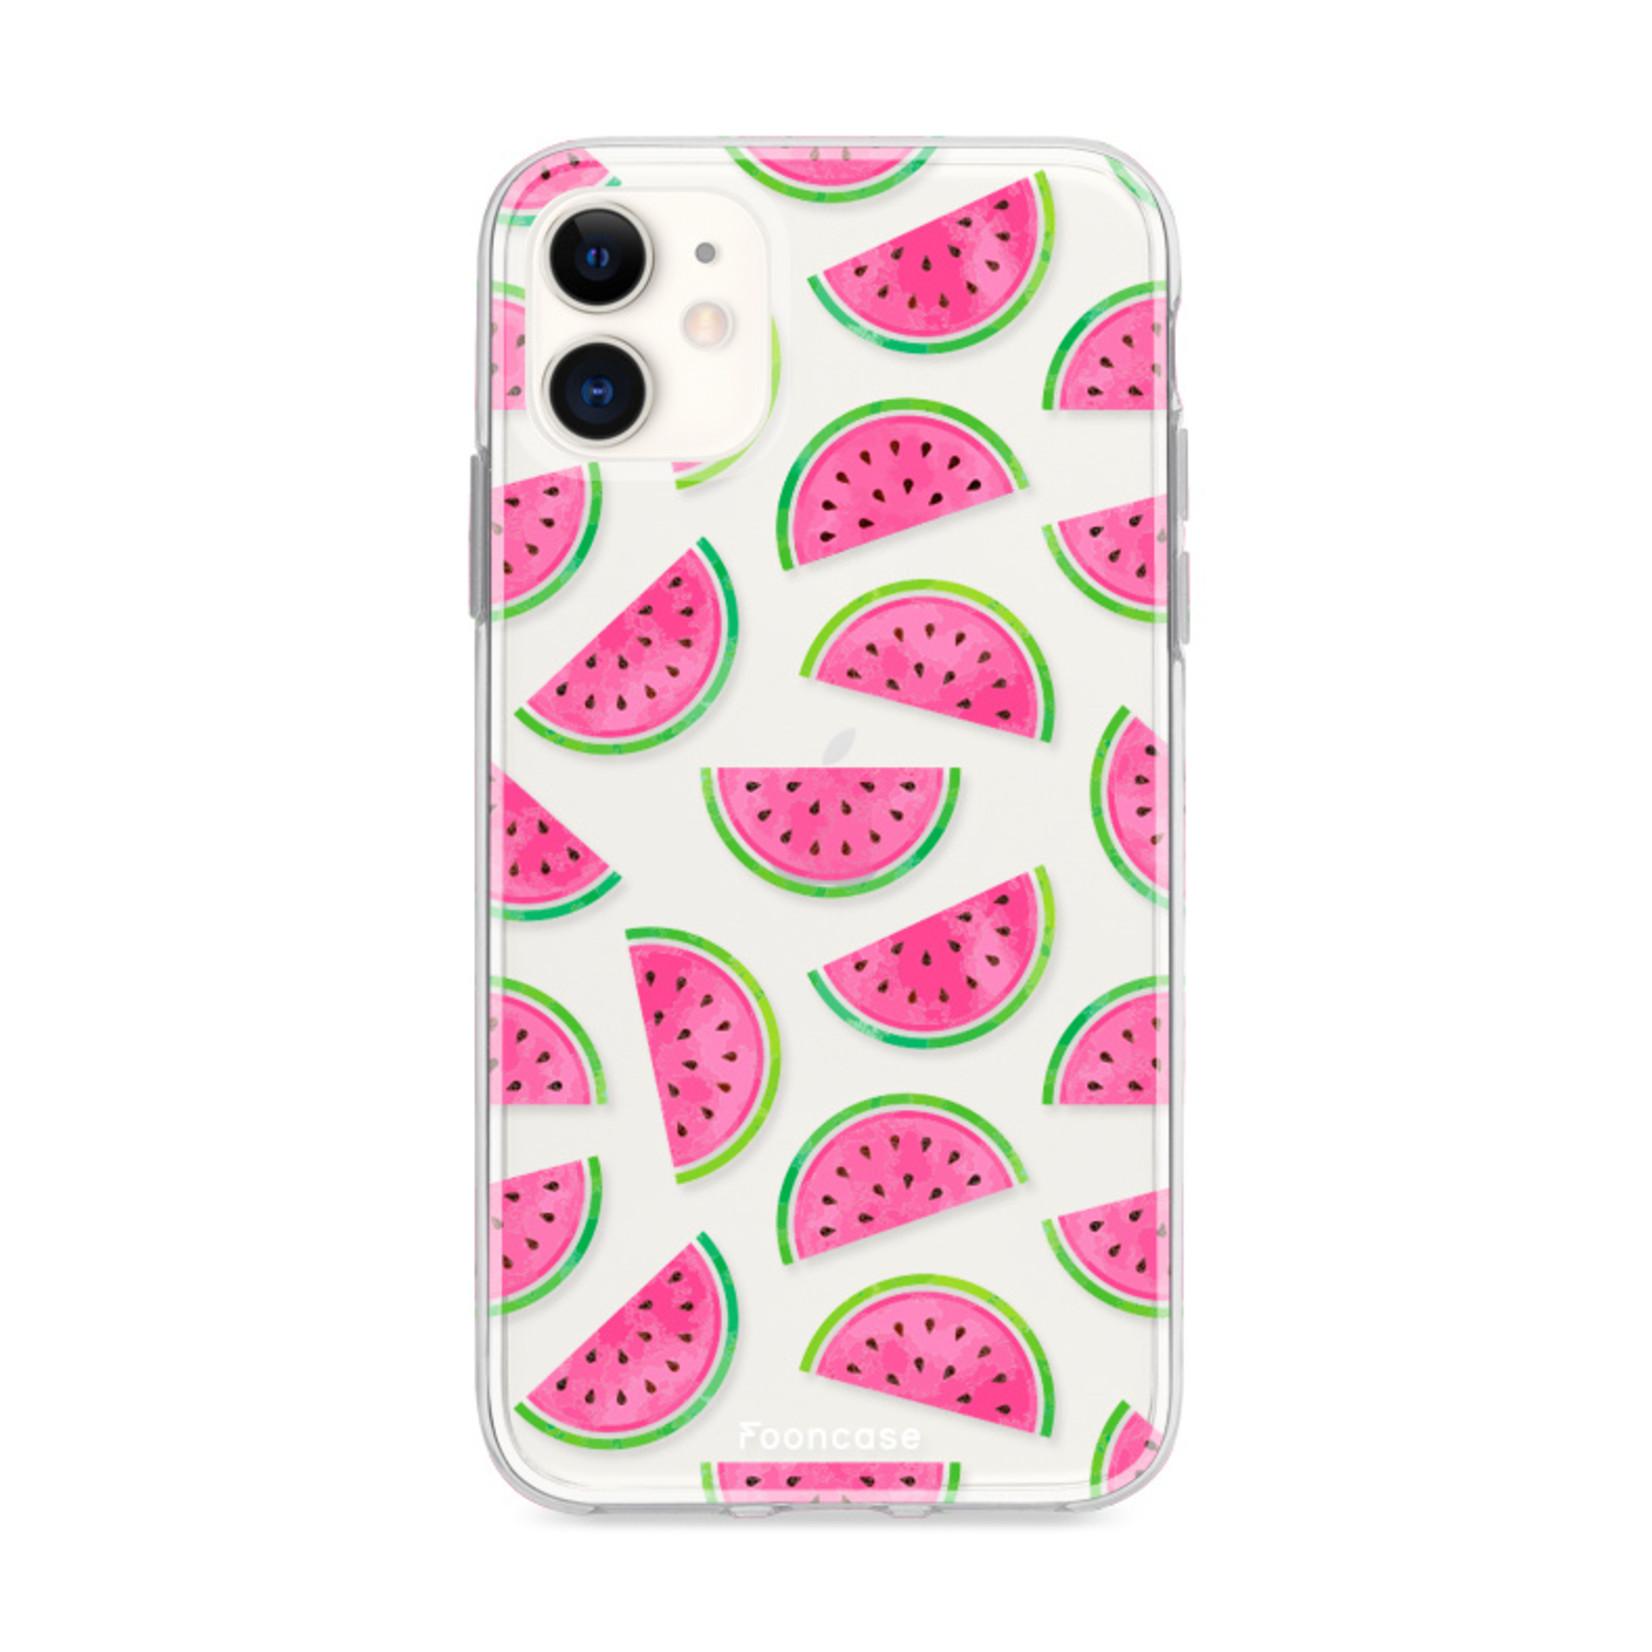 FOONCASE Iphone 11 Handyhülle - Wassermelone